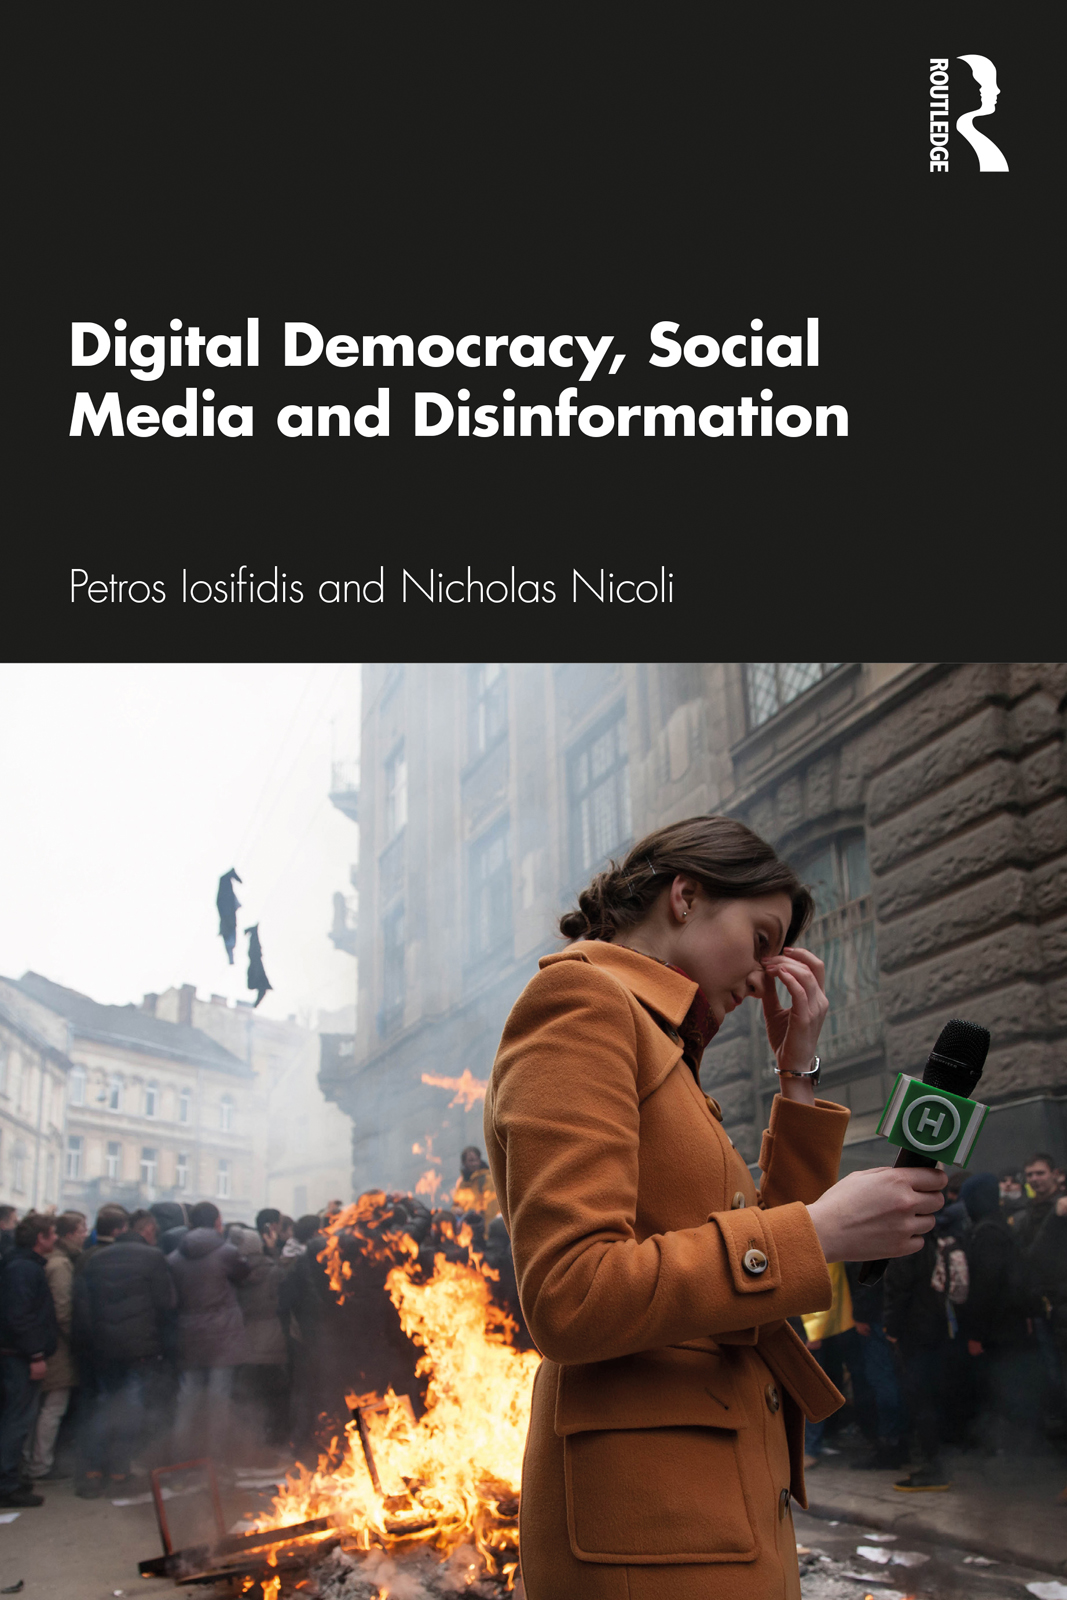 Digital Democracy, Social Media and Disinformation